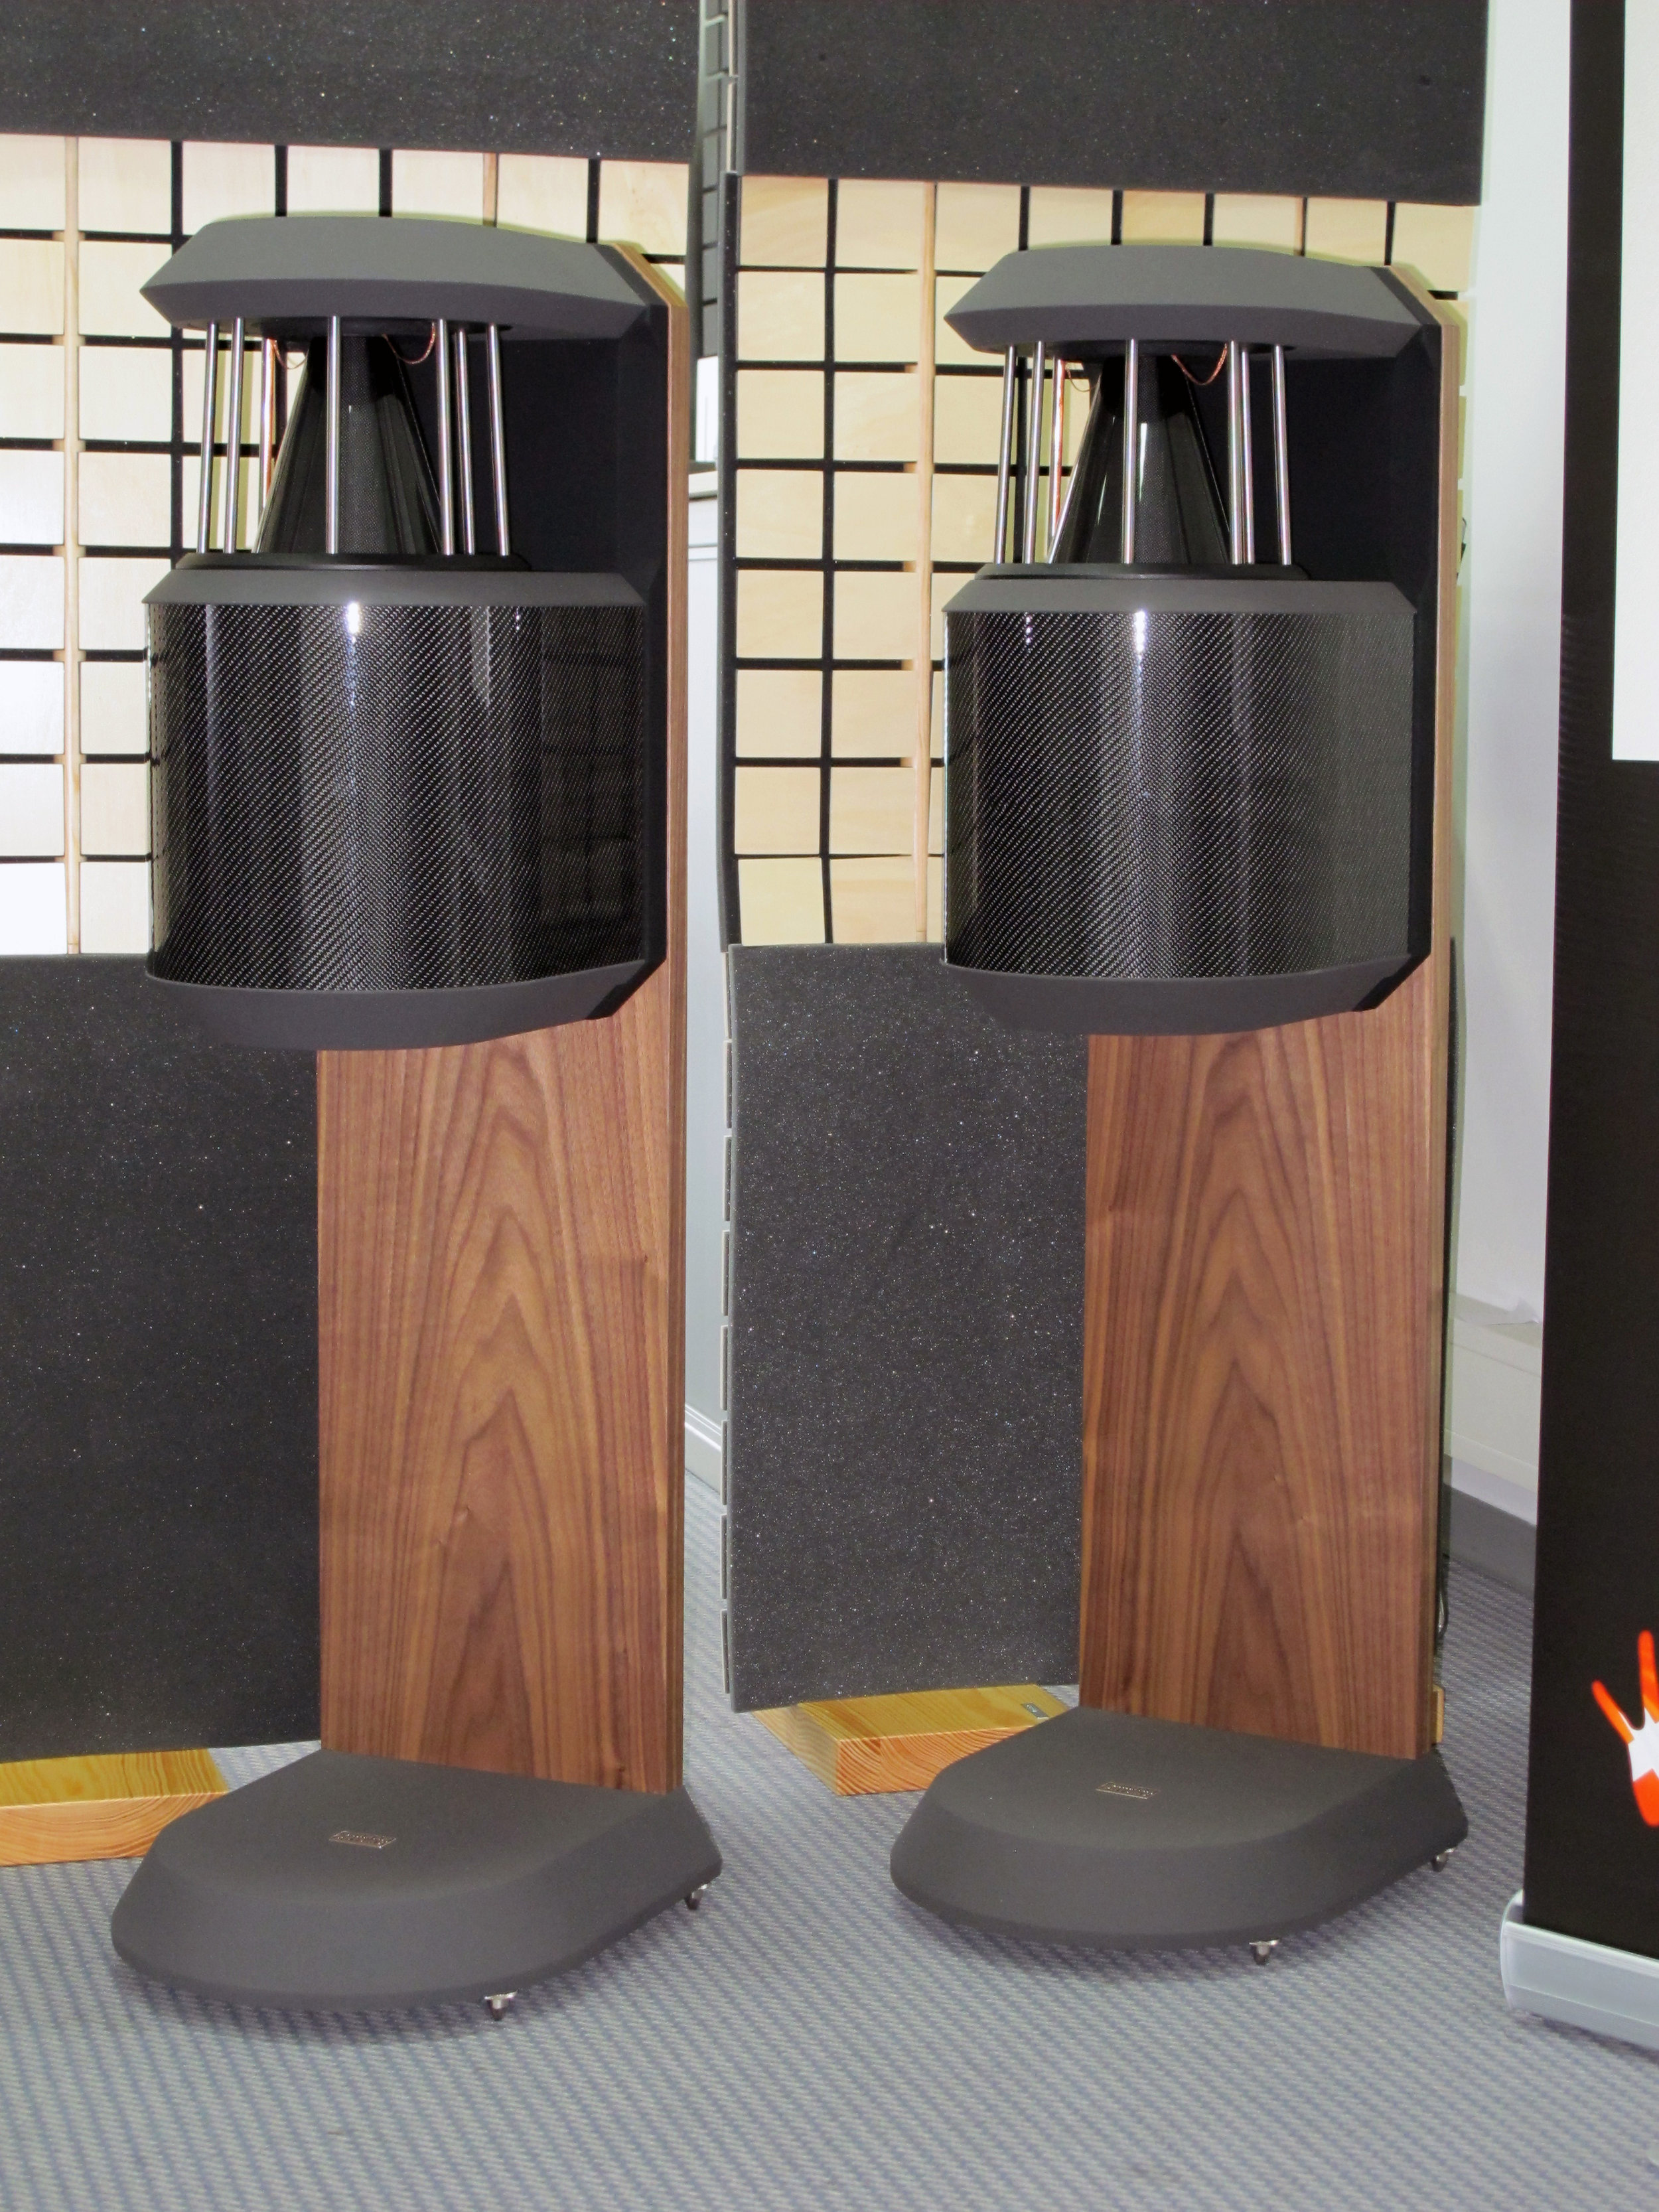 PQS-100 Plus loudspeakers | Munich Hi-Fi Show 2010, Germany